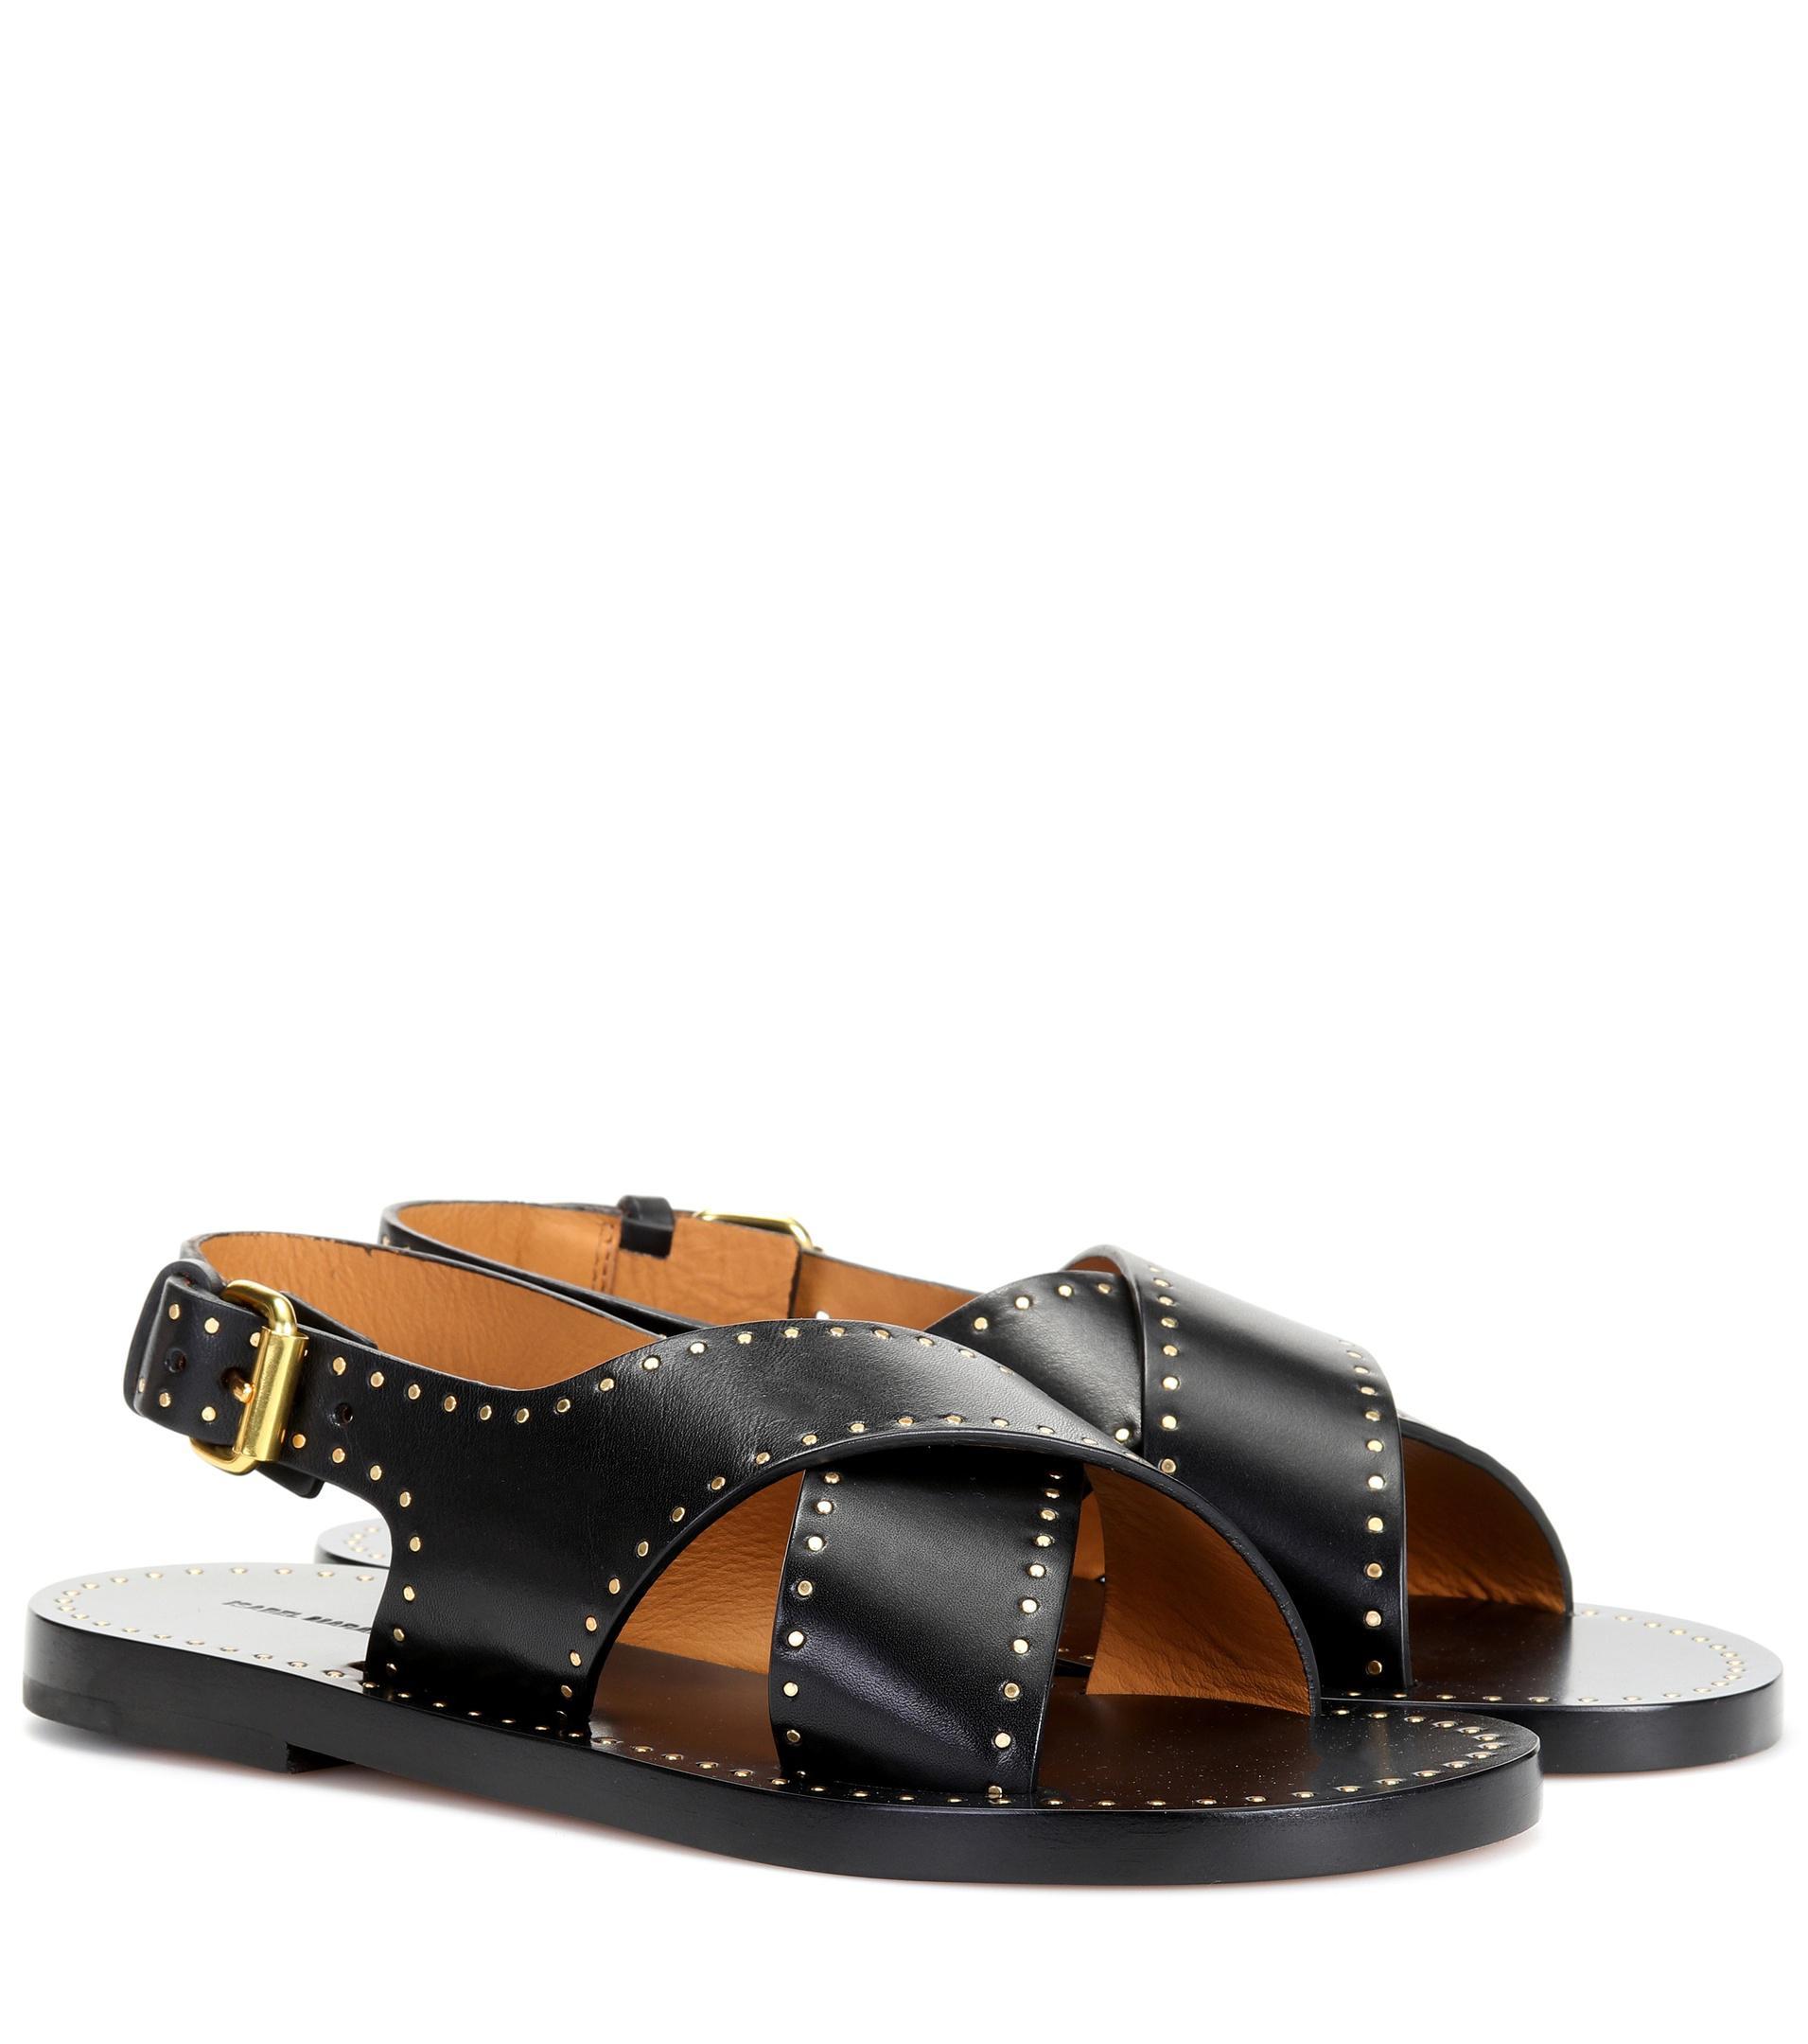 Sandales en cuir JaneIsabel Marant bZAS4XgAz